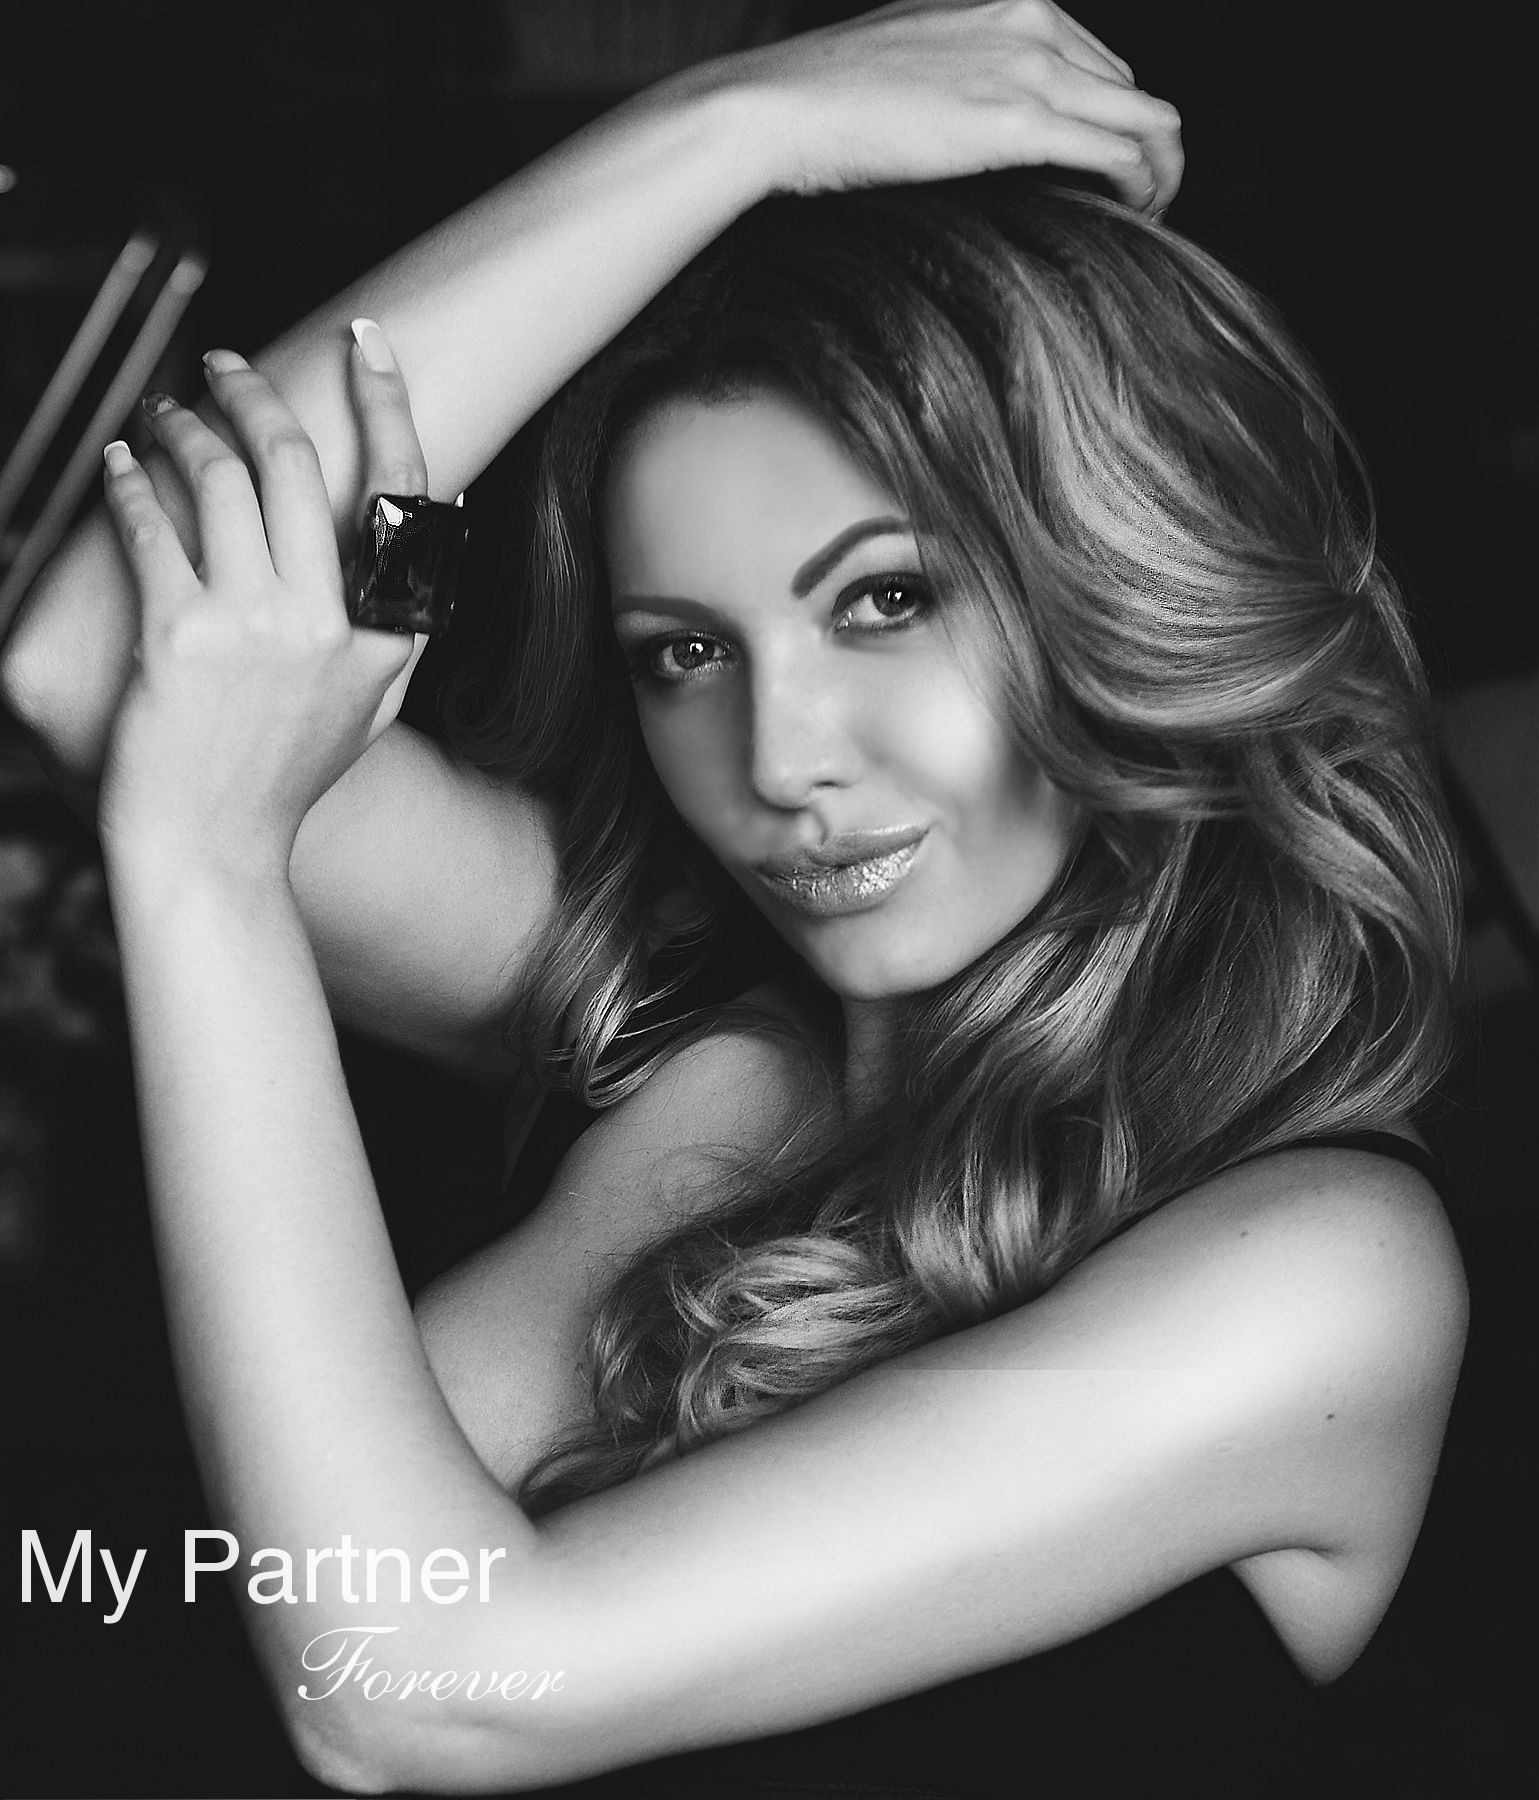 Ukrainian women for marriage. Ukraine ladies dating | UA ...